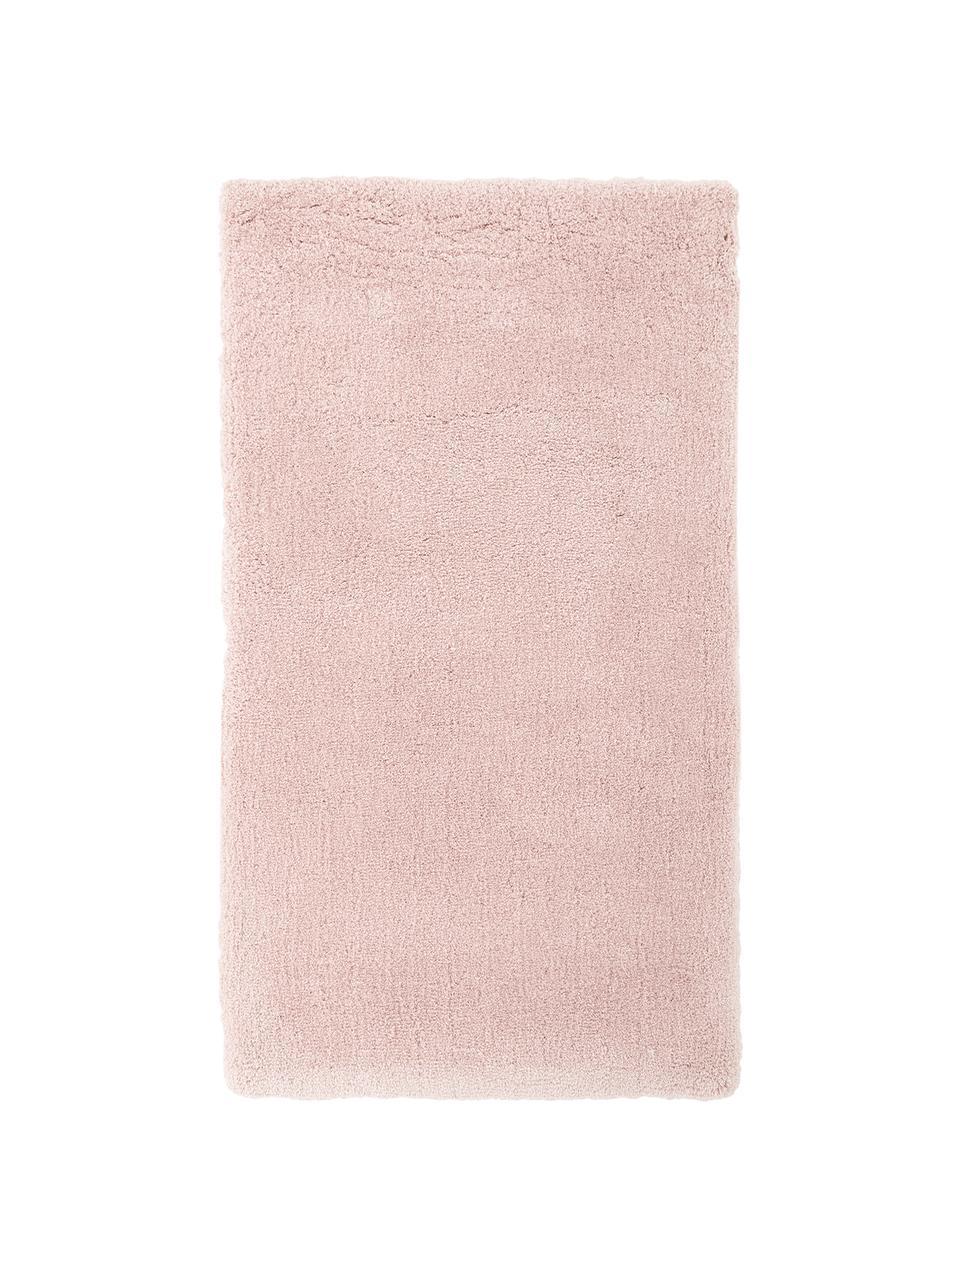 Tappeto morbido a pelo lungo rosa Leighton, Retro: 70% poliestere, 30% coton, Rosa, Larg. 80 x Lung. 150 cm (taglia XS)